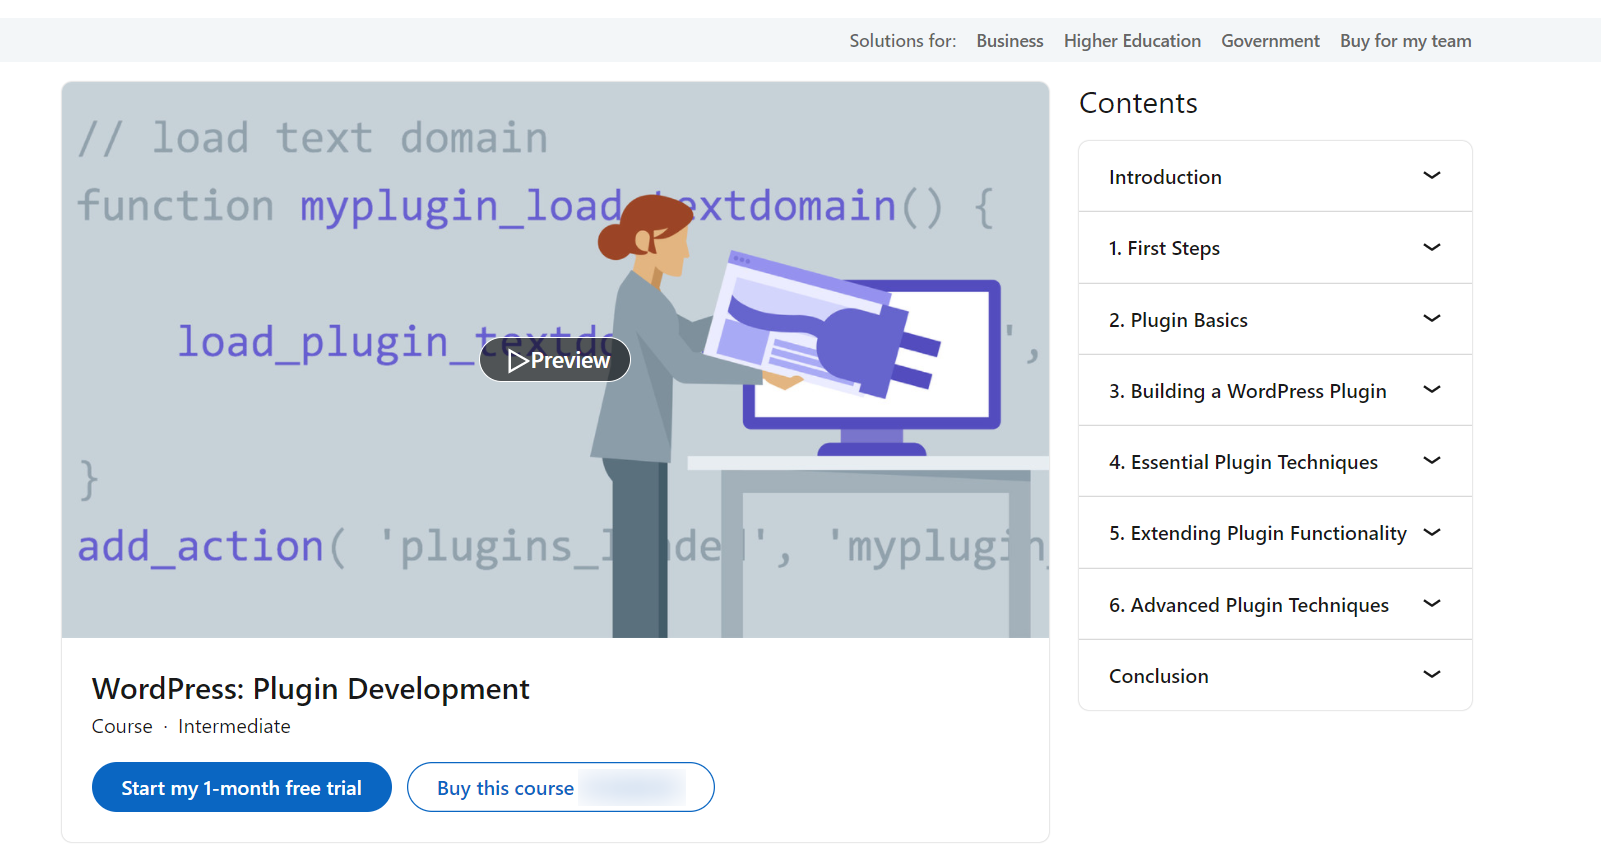 WordPress: Plugin Development